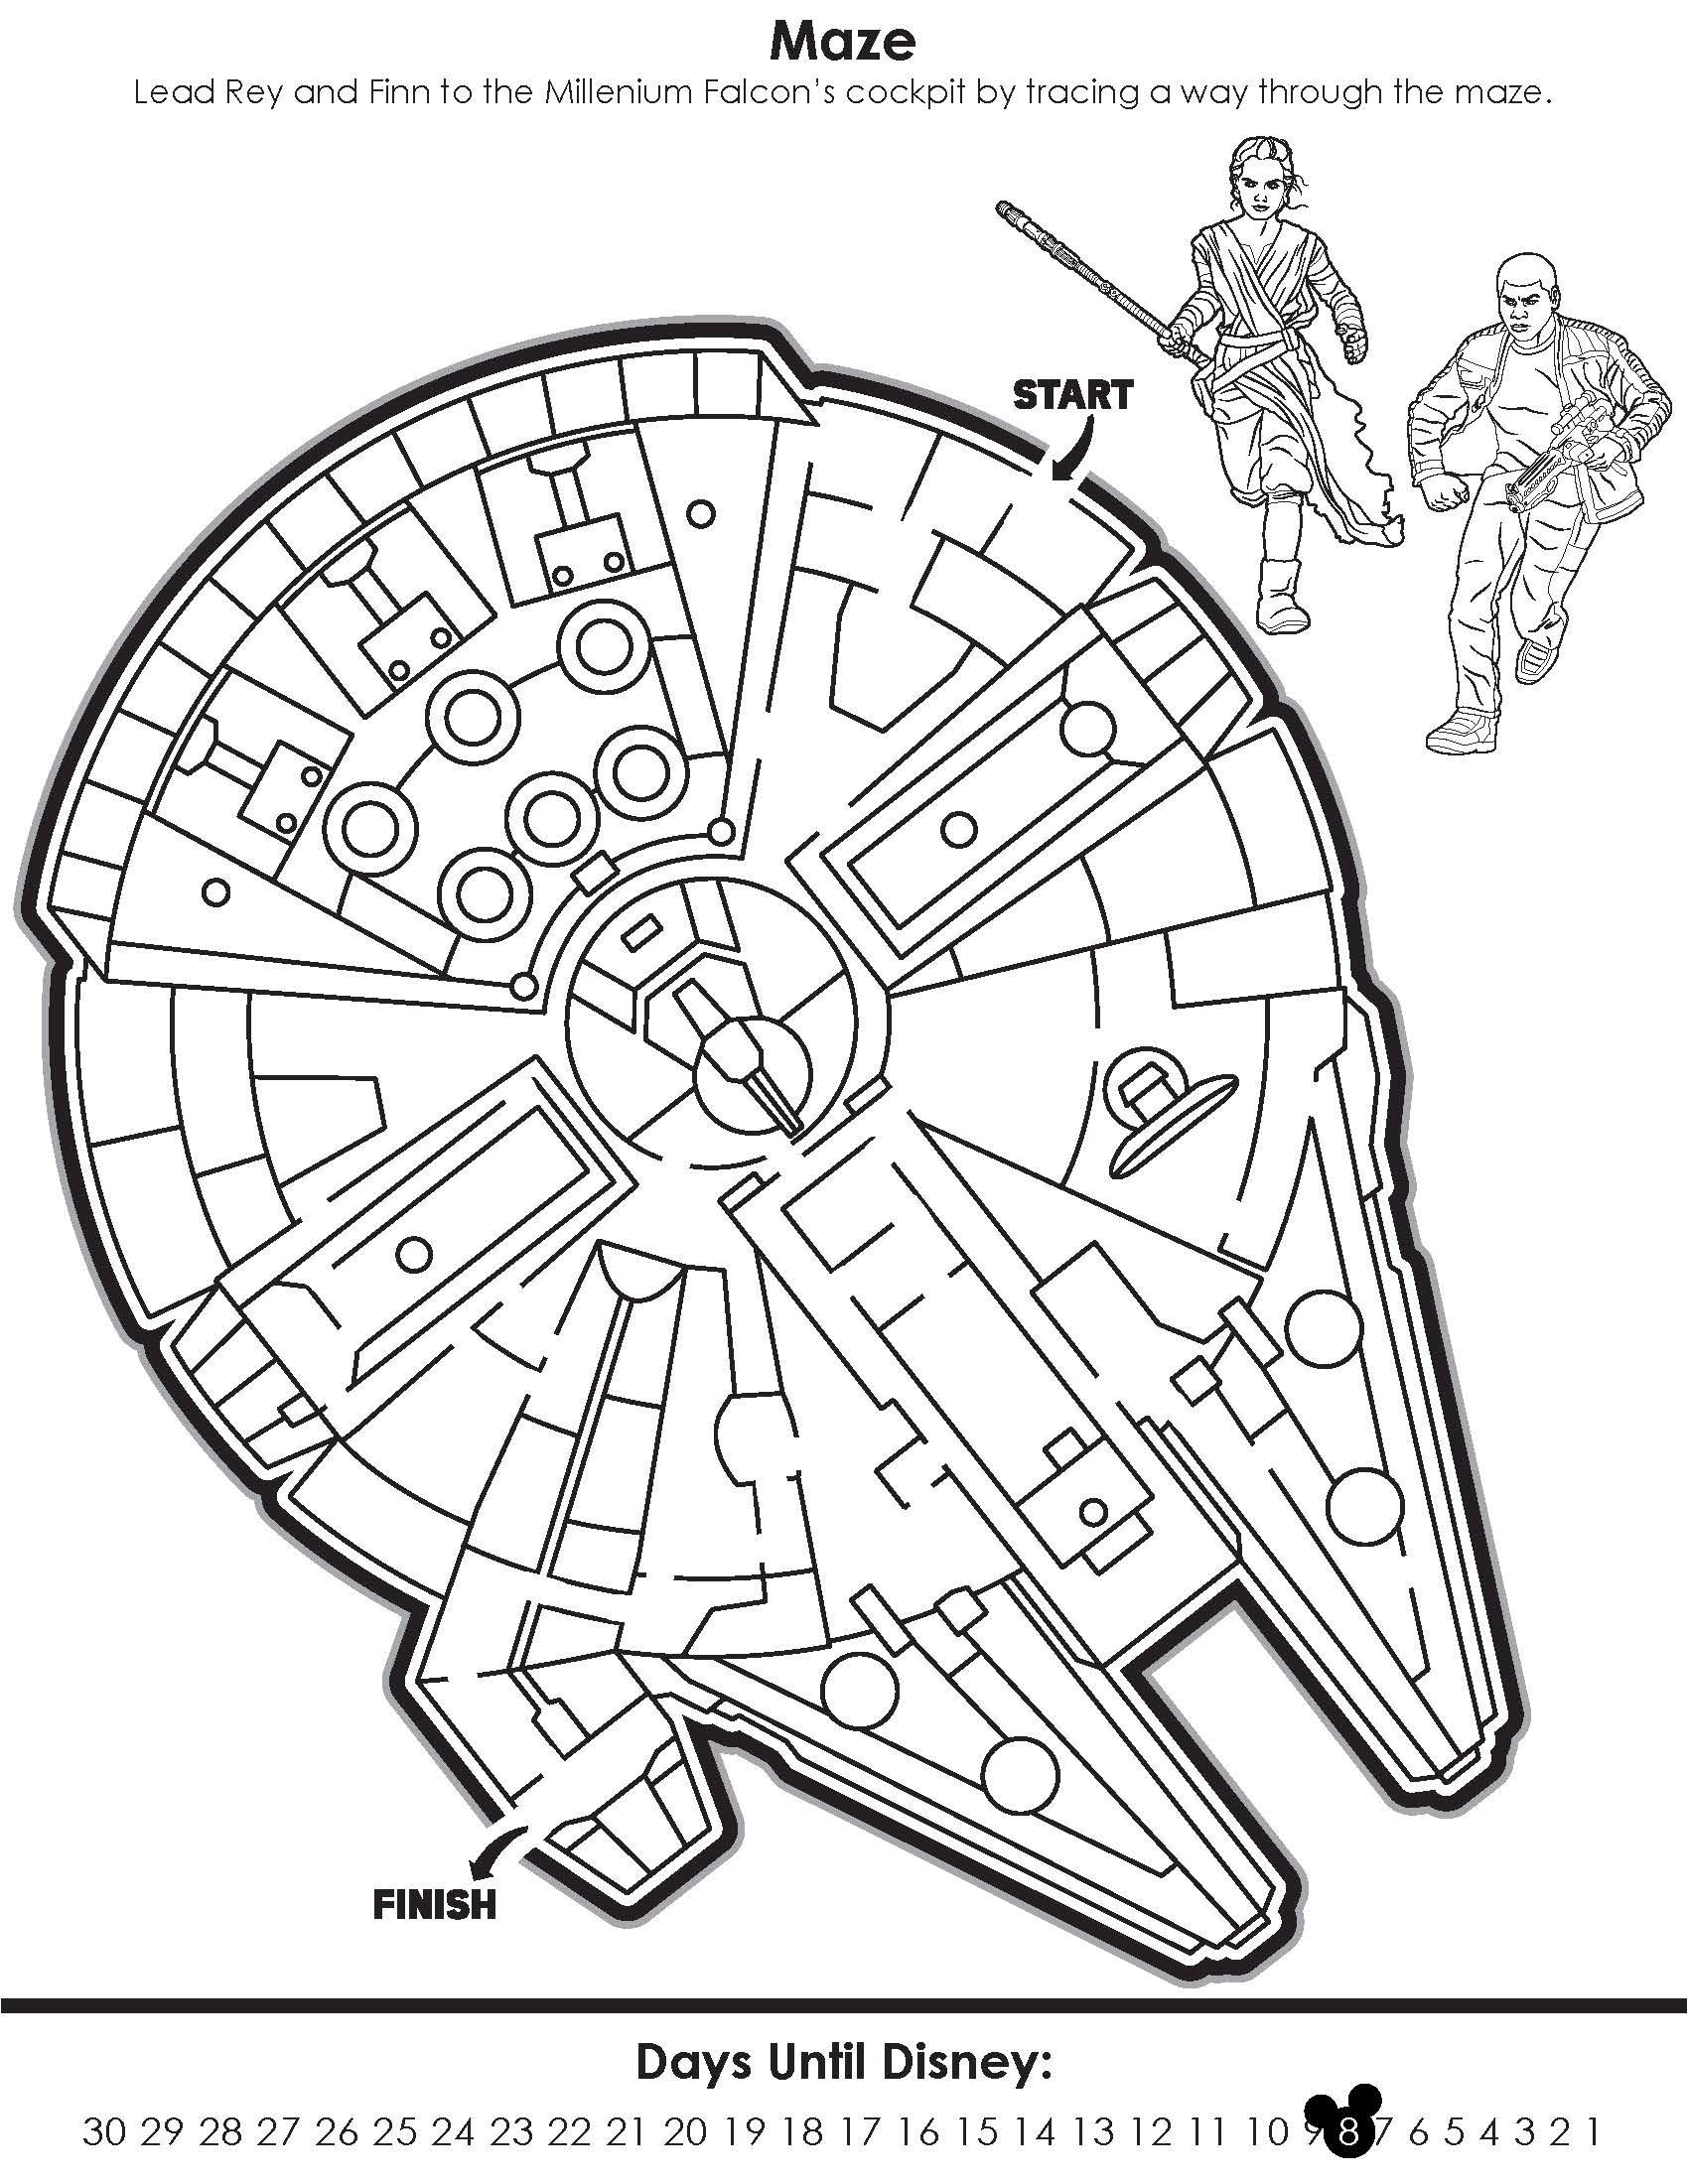 Disney Calendar_Page_24.jpg